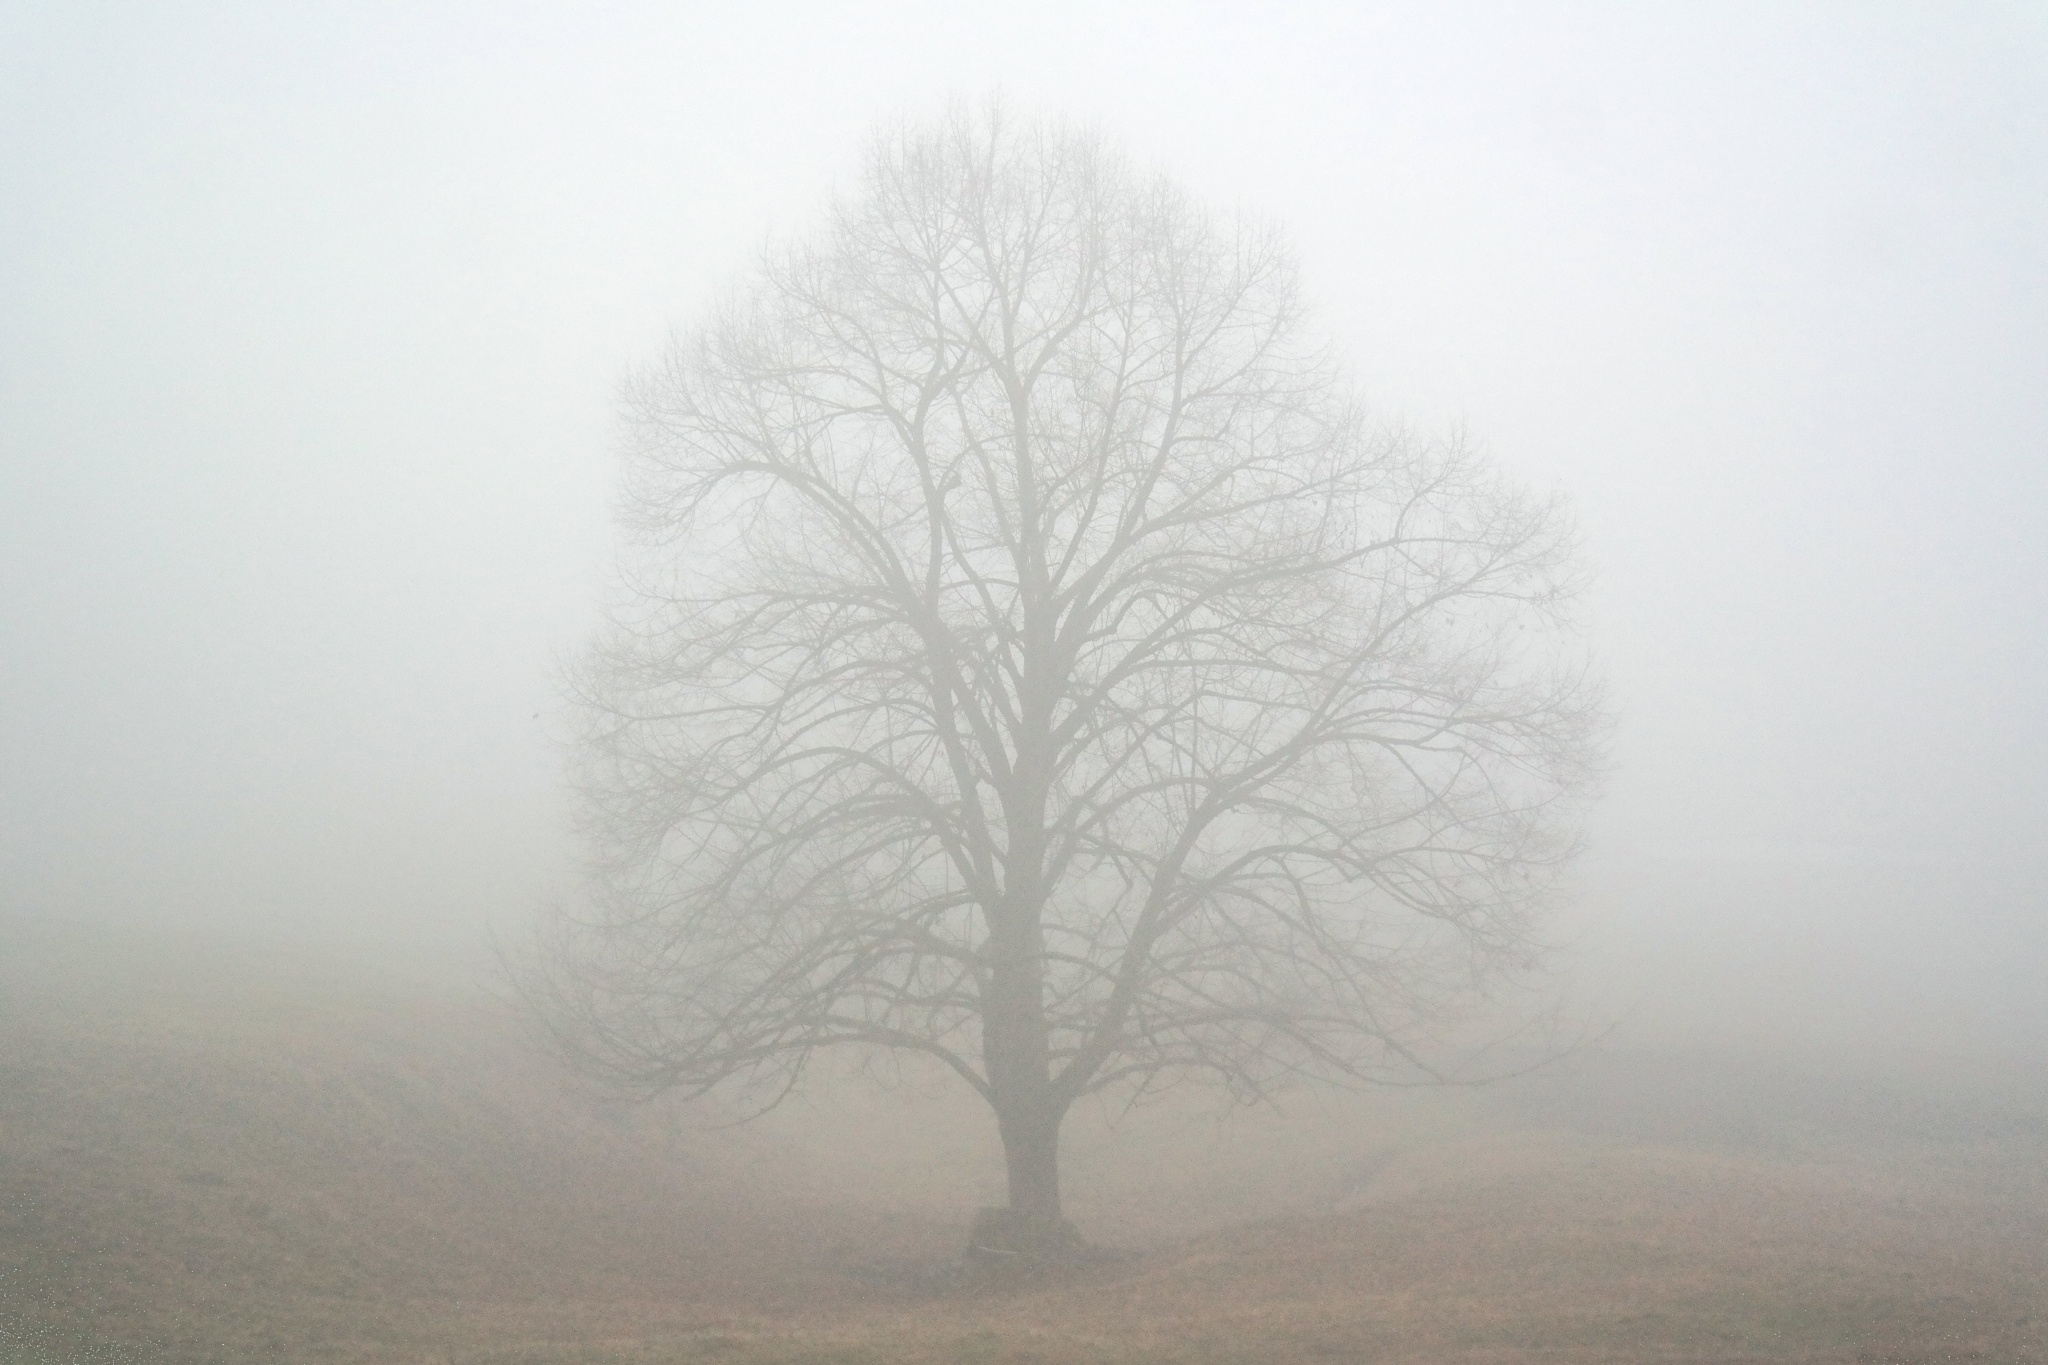 Misty by Hotel Buchenhain Photography